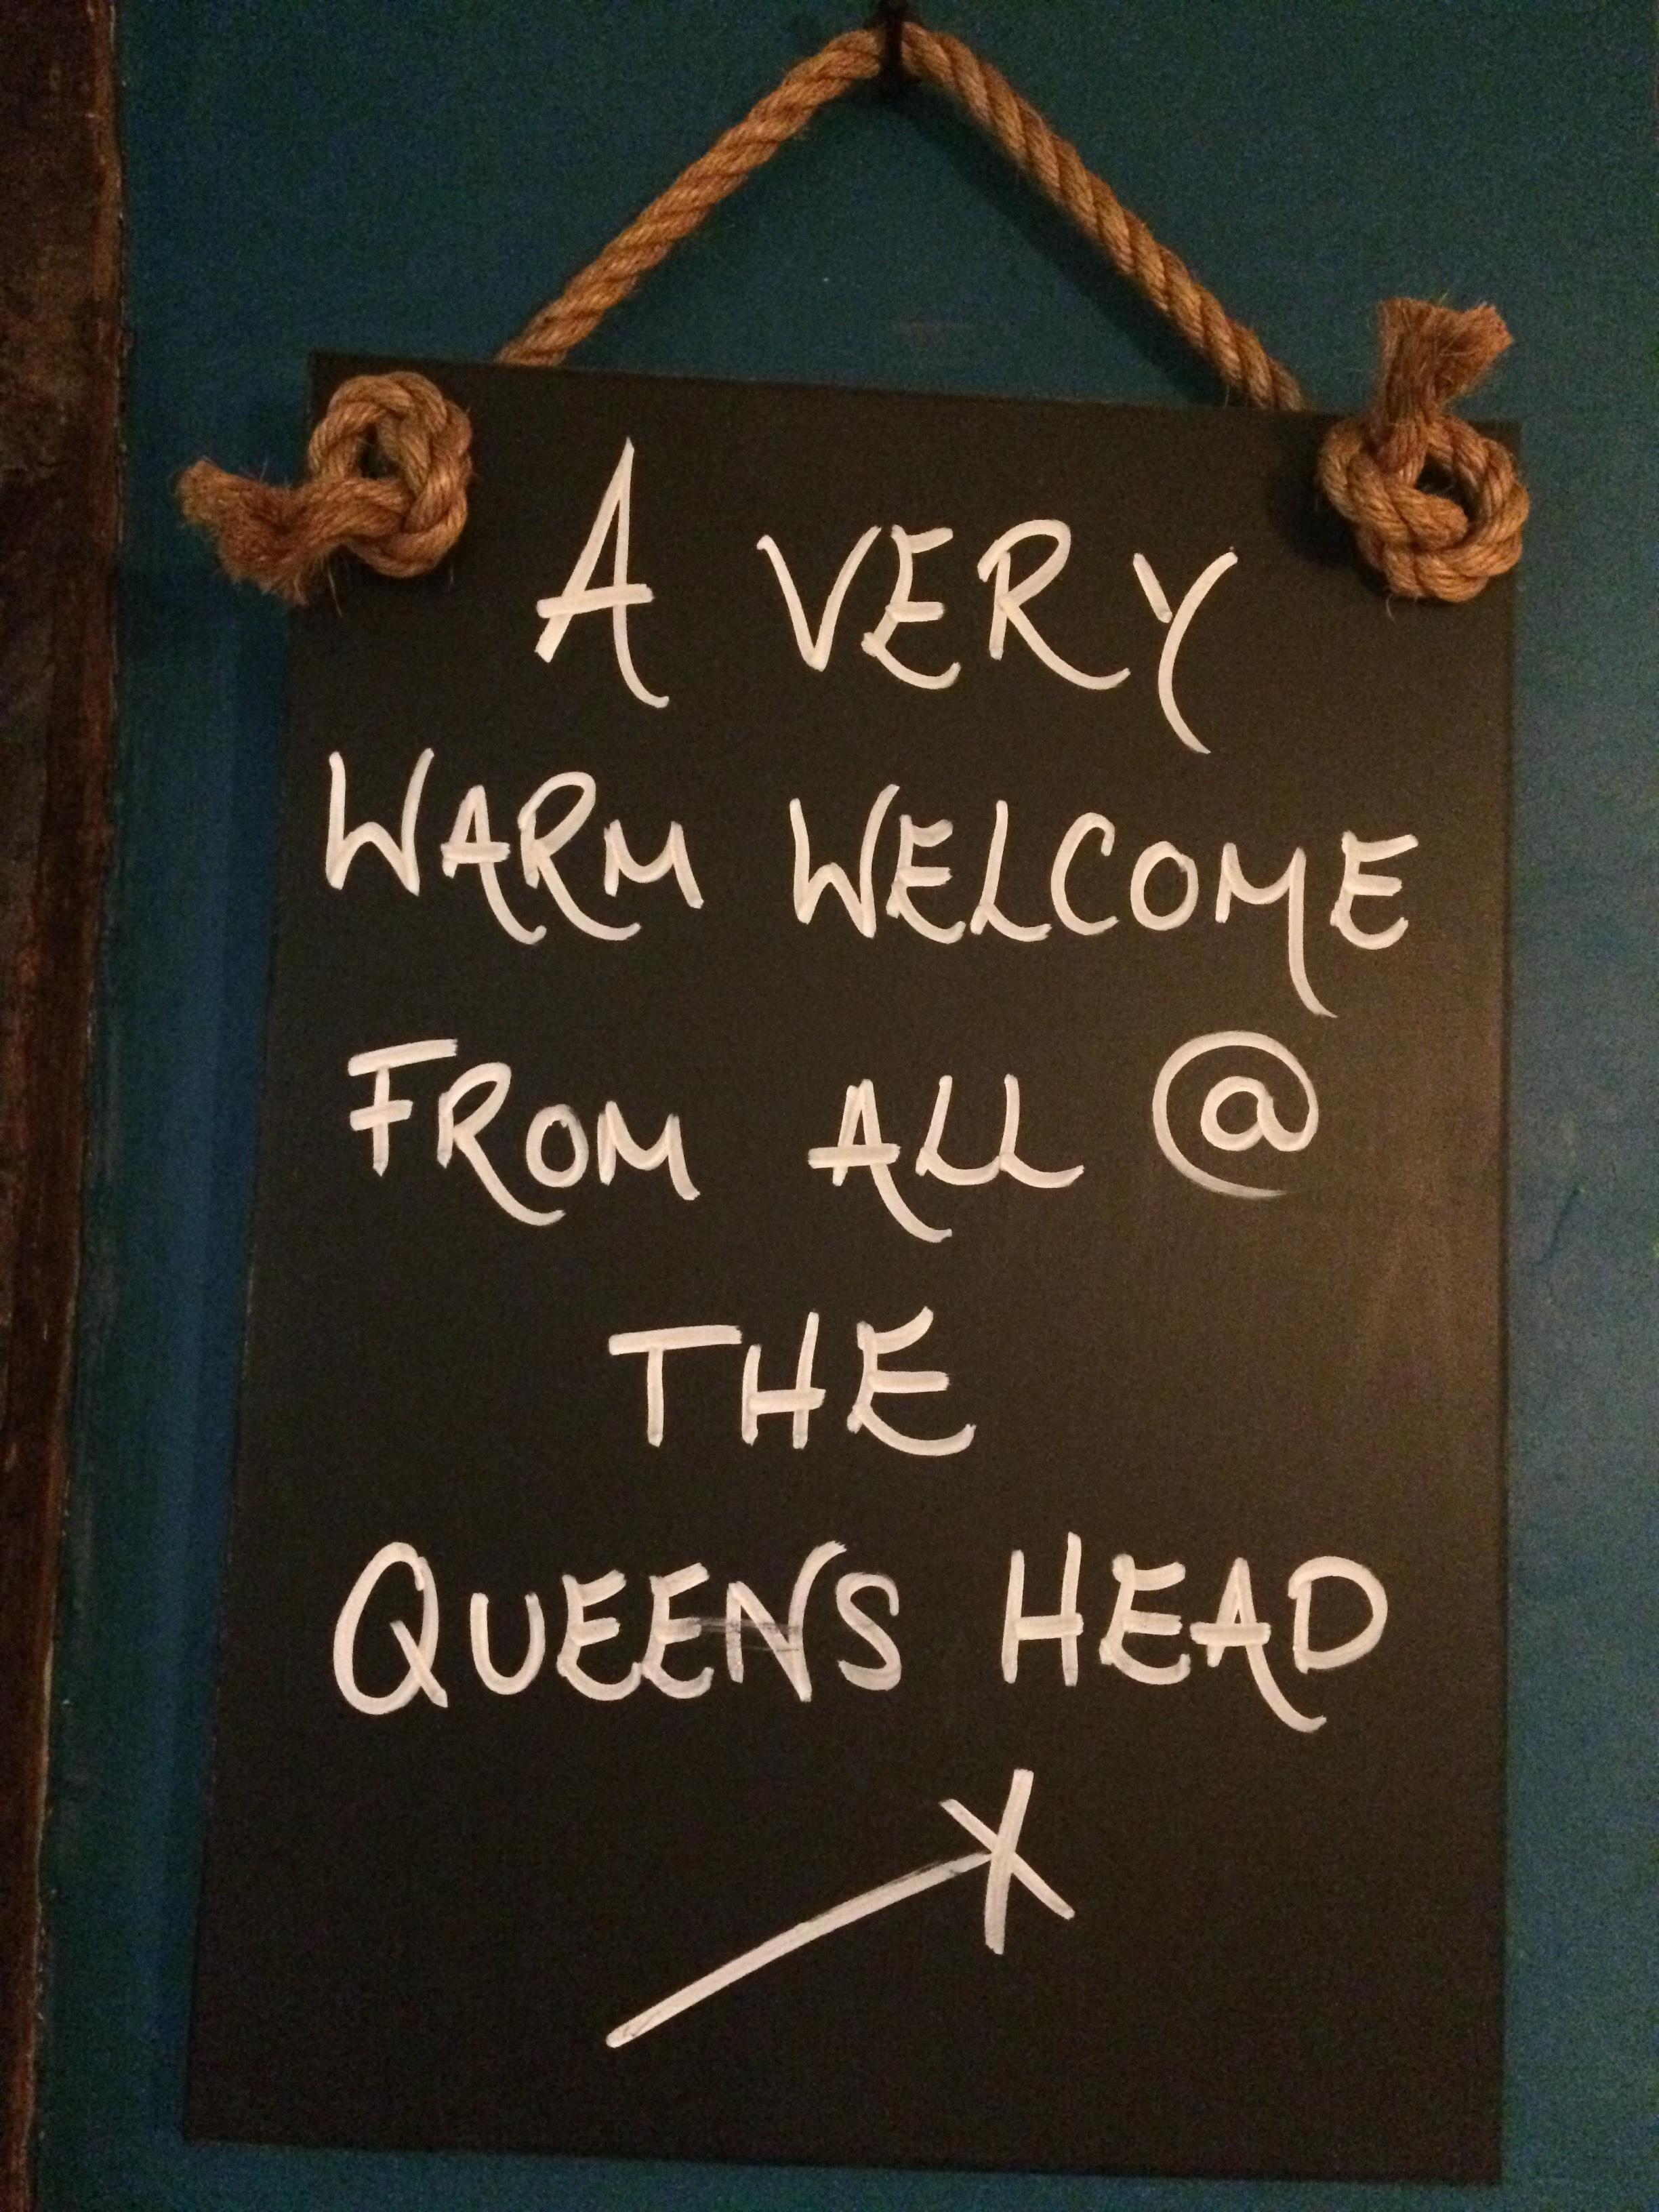 Best Pubs in London: The Queens Head, Brook Green Hammersmith